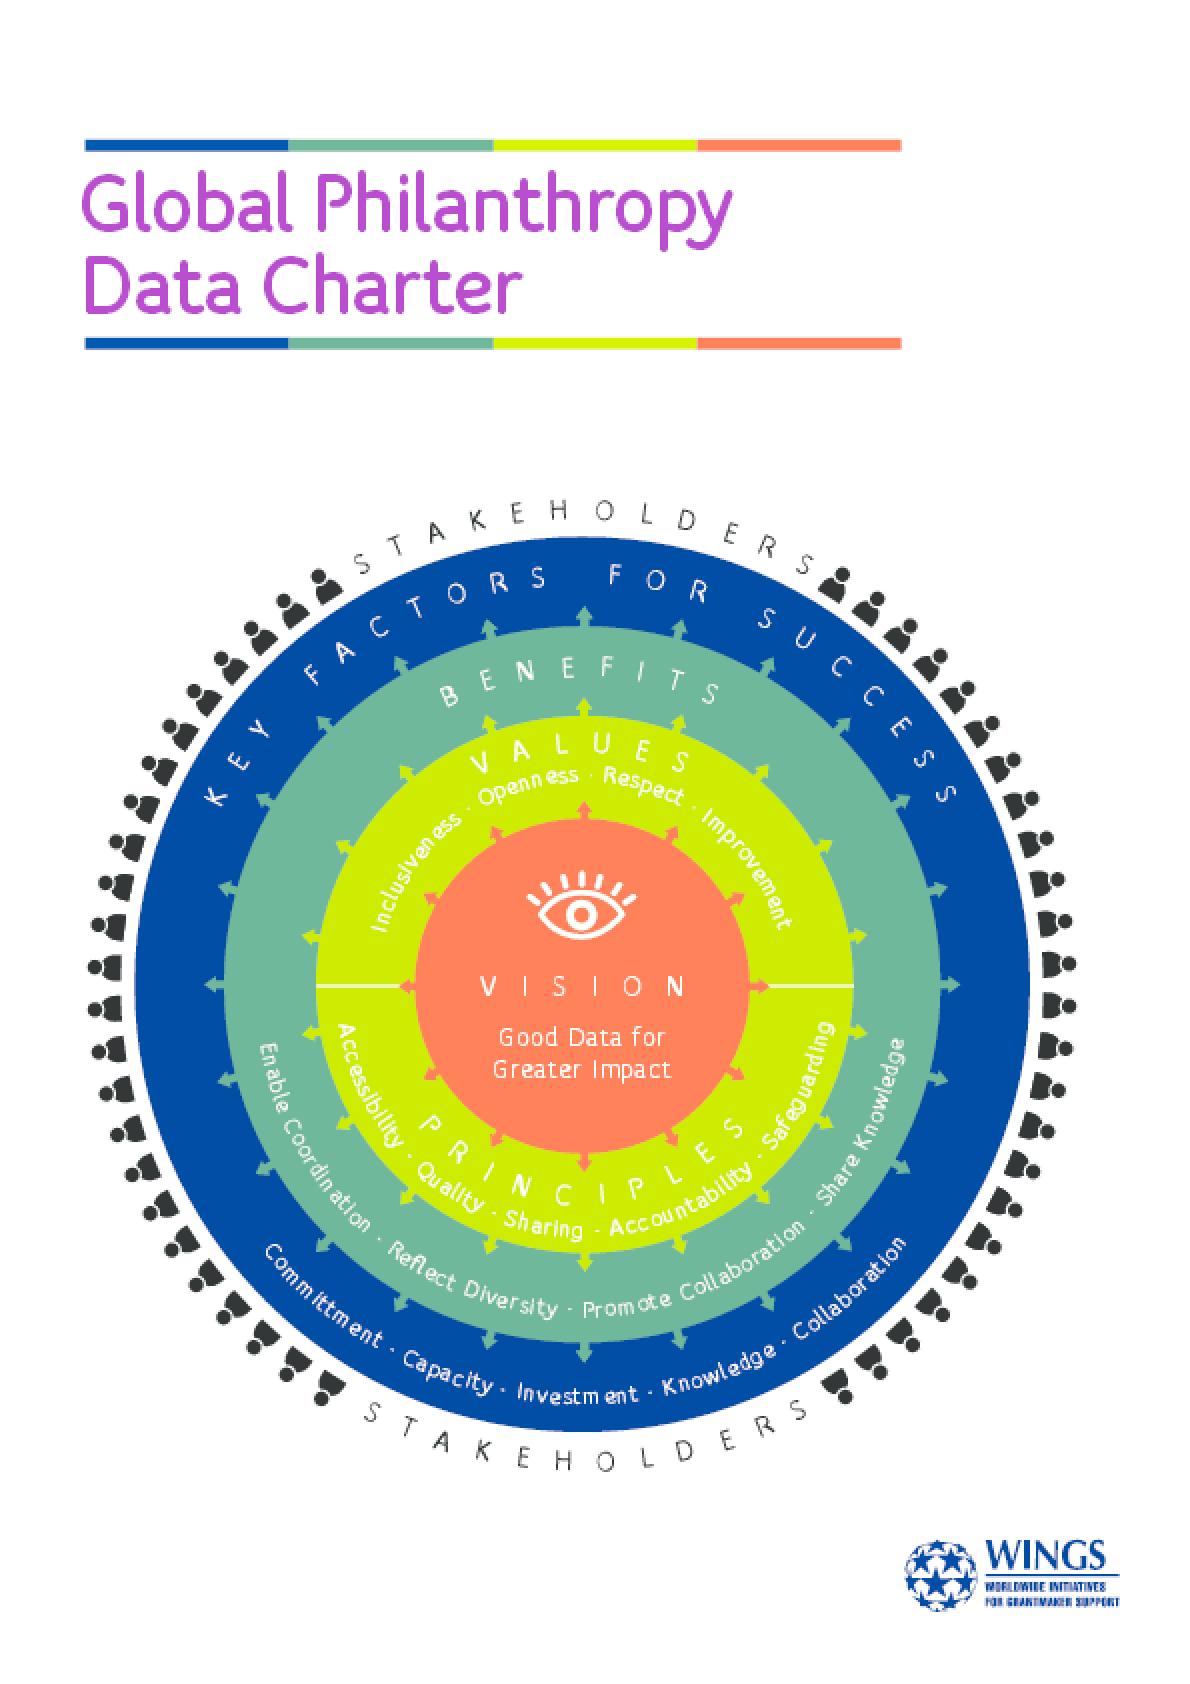 Global Philanthropy Data Charter